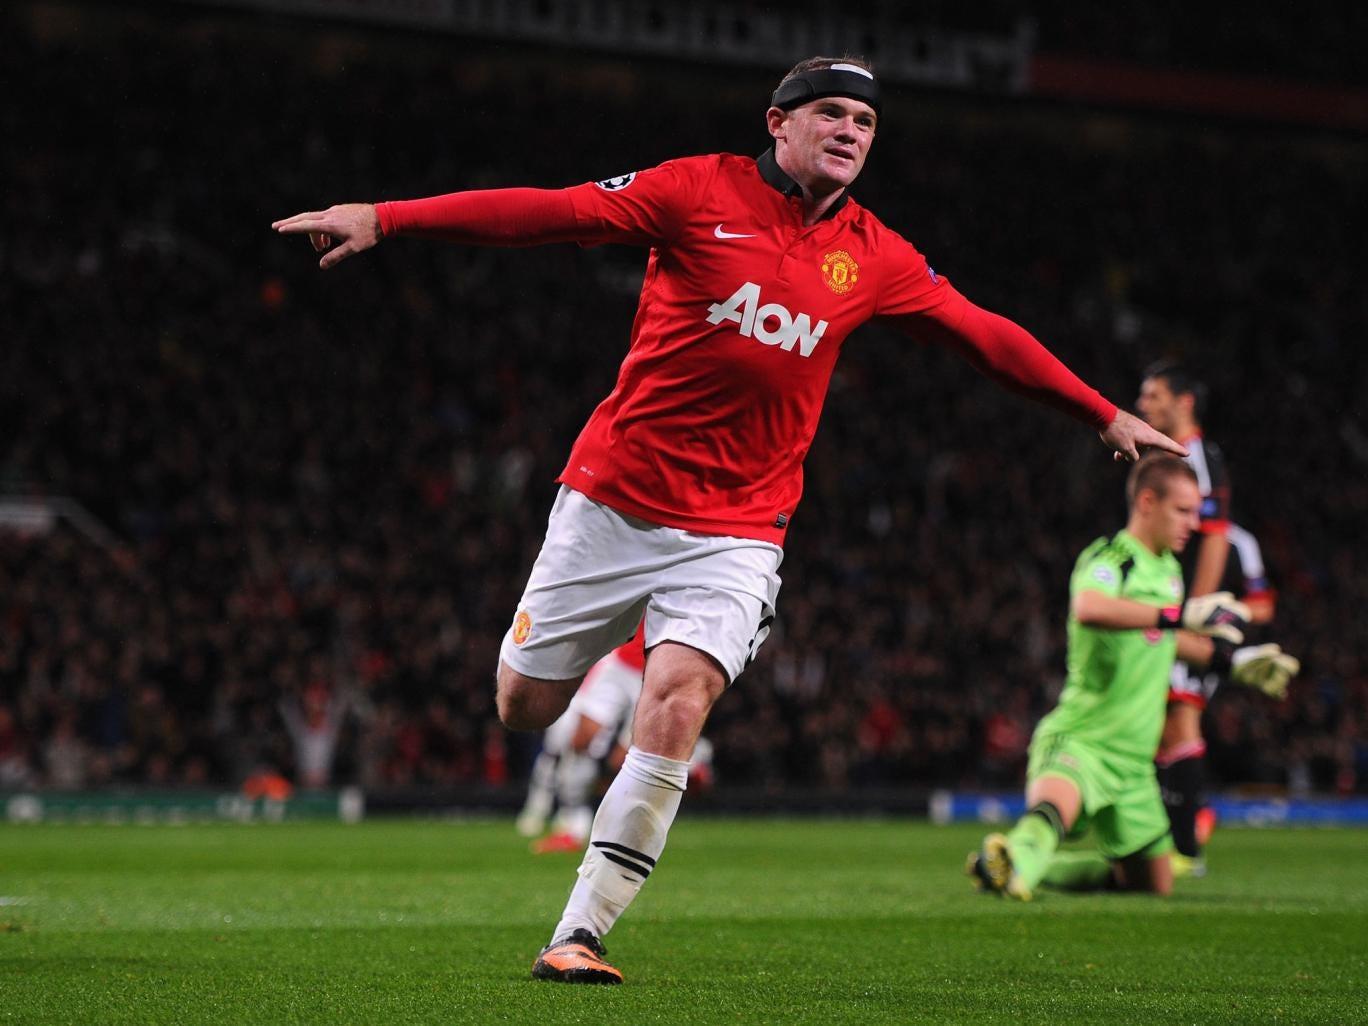 Wayne Rooney celebrates scoring against Bayer Leverkusen